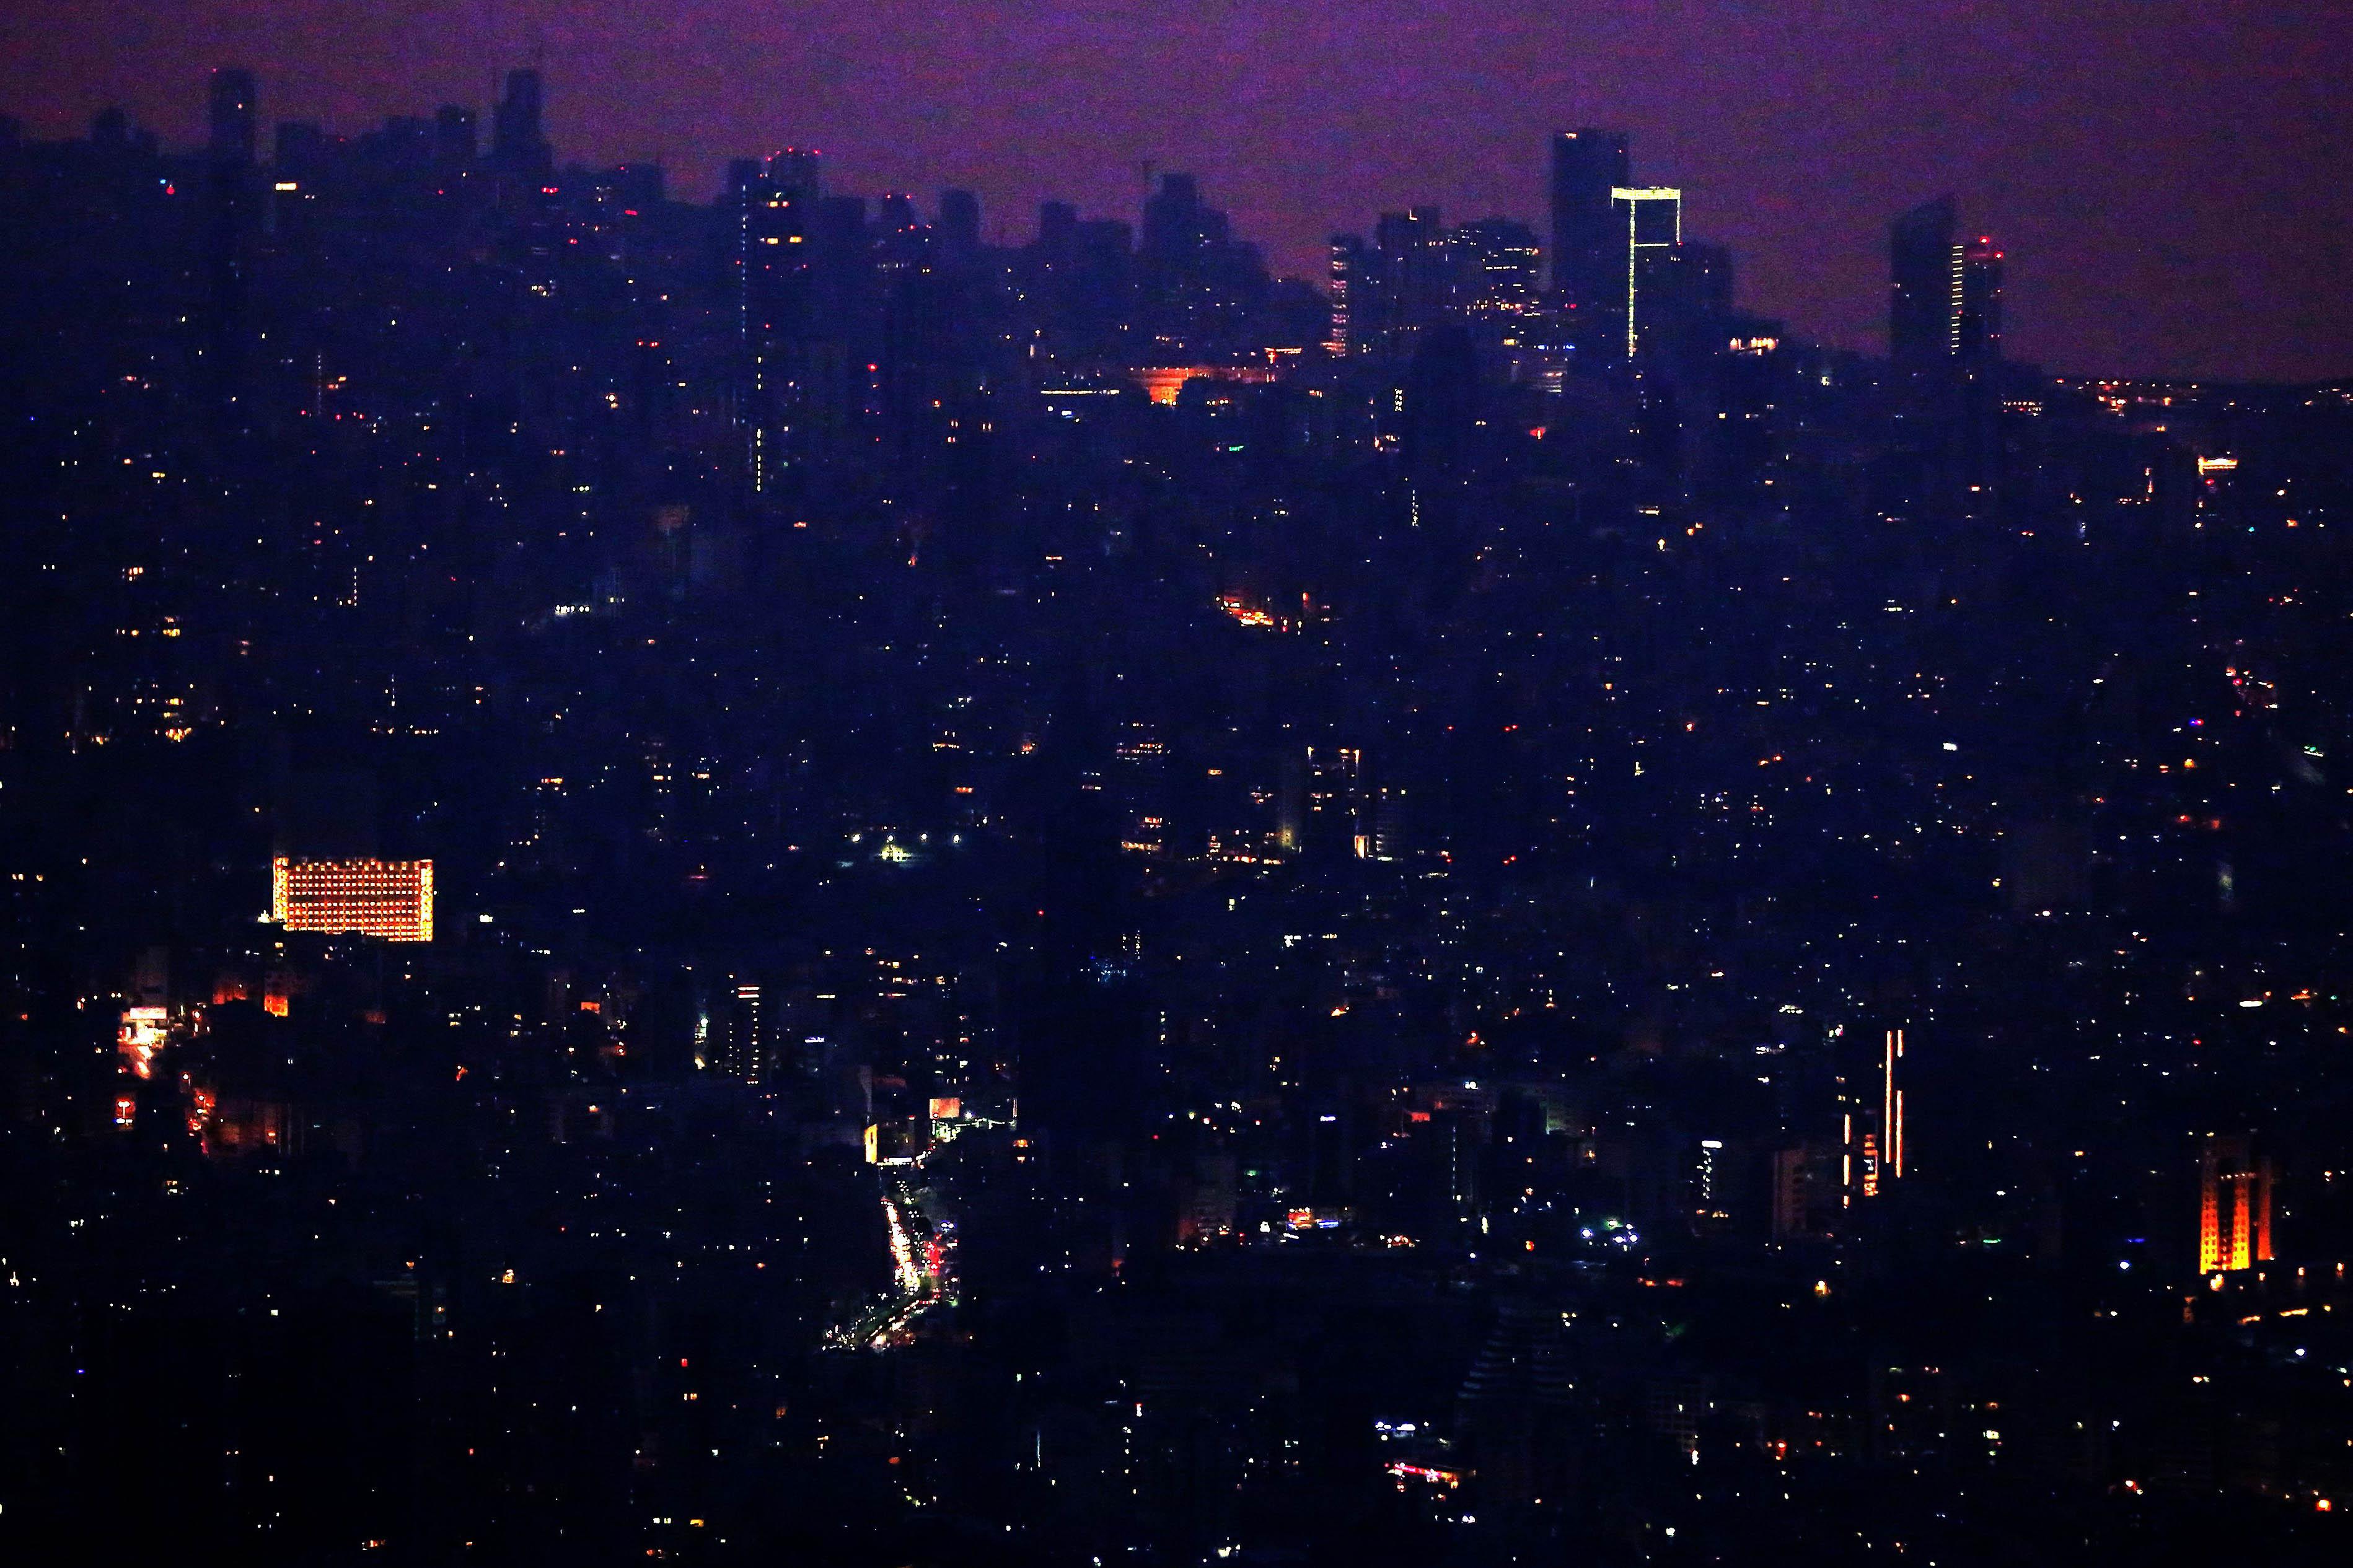 Lebanon: Failure to Address Economic, Political Crisis